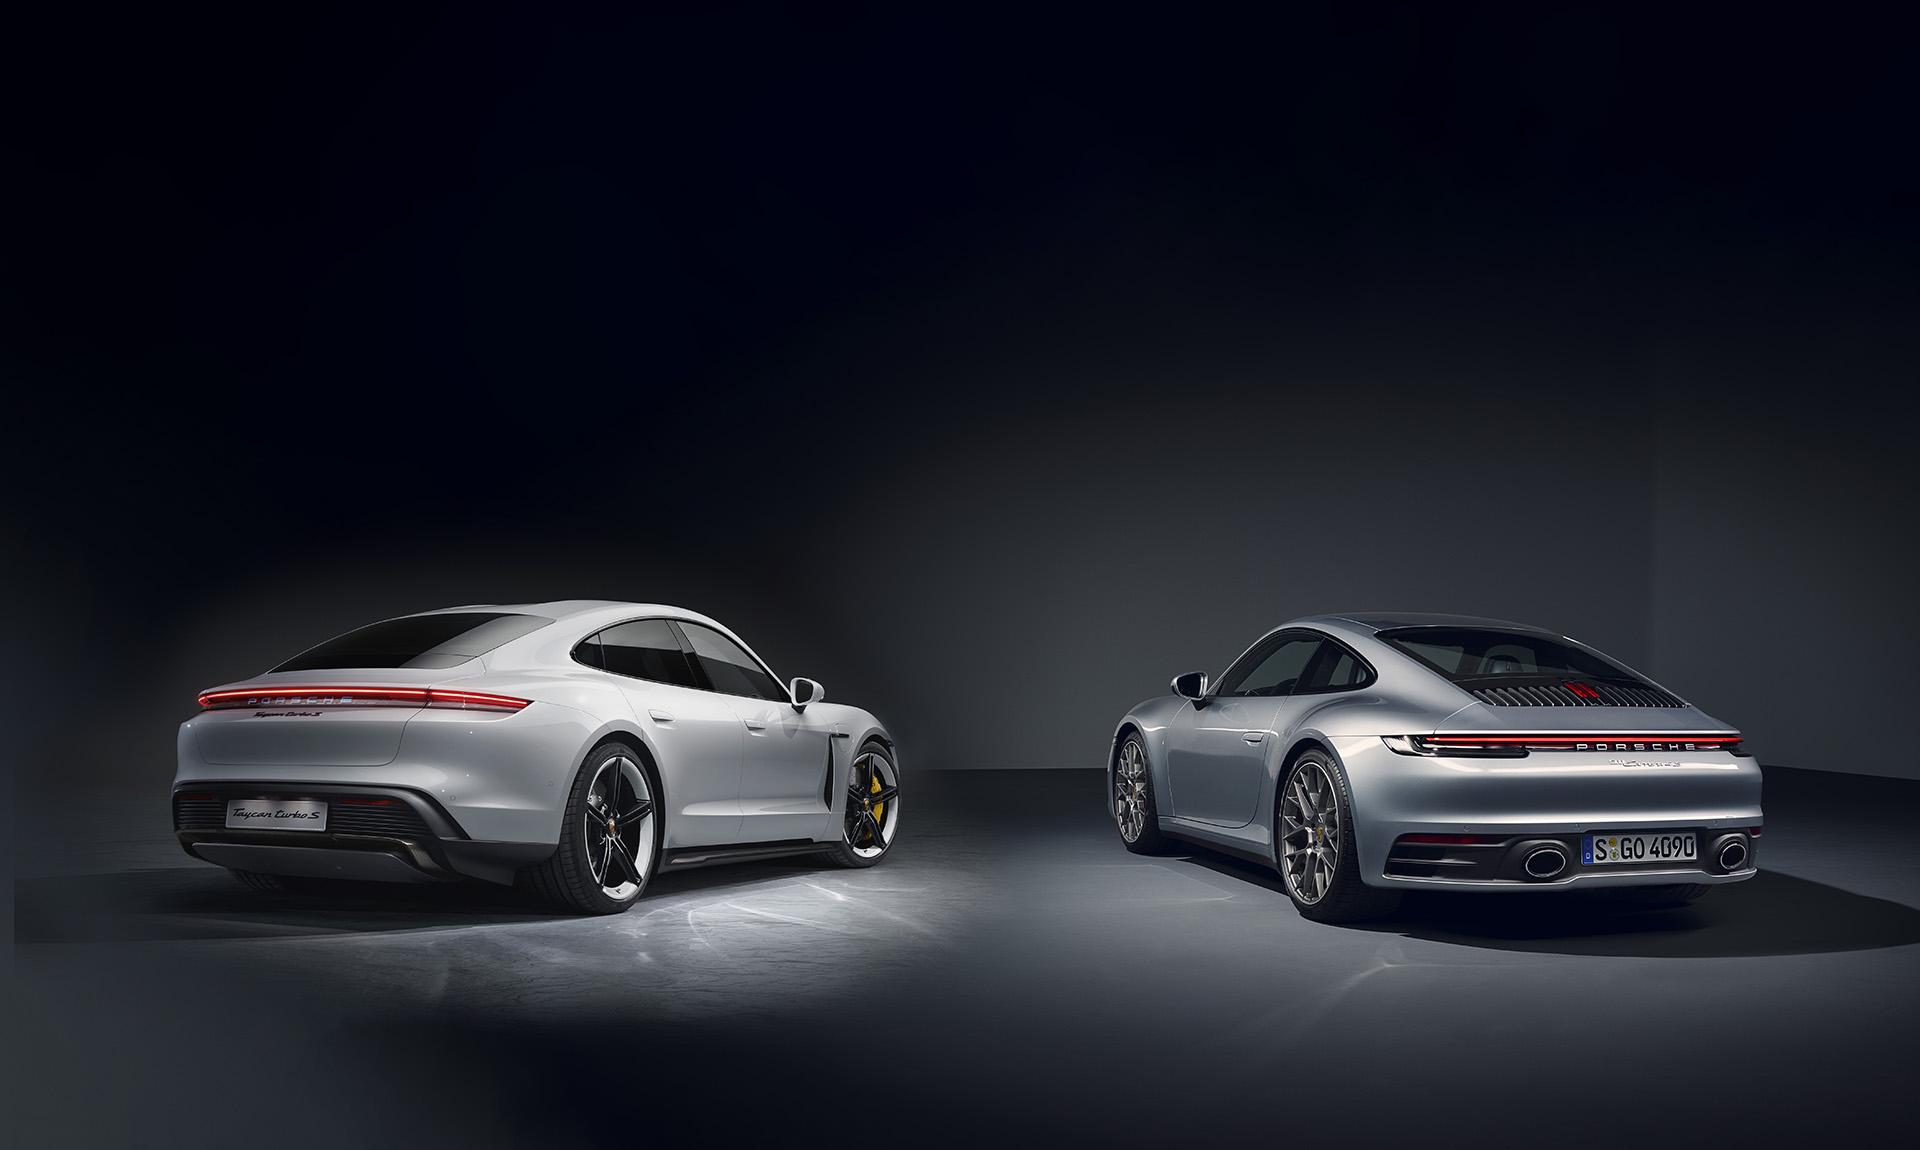 2020 Porsche 911 vs. 2020 Porsche Taycan Performance past